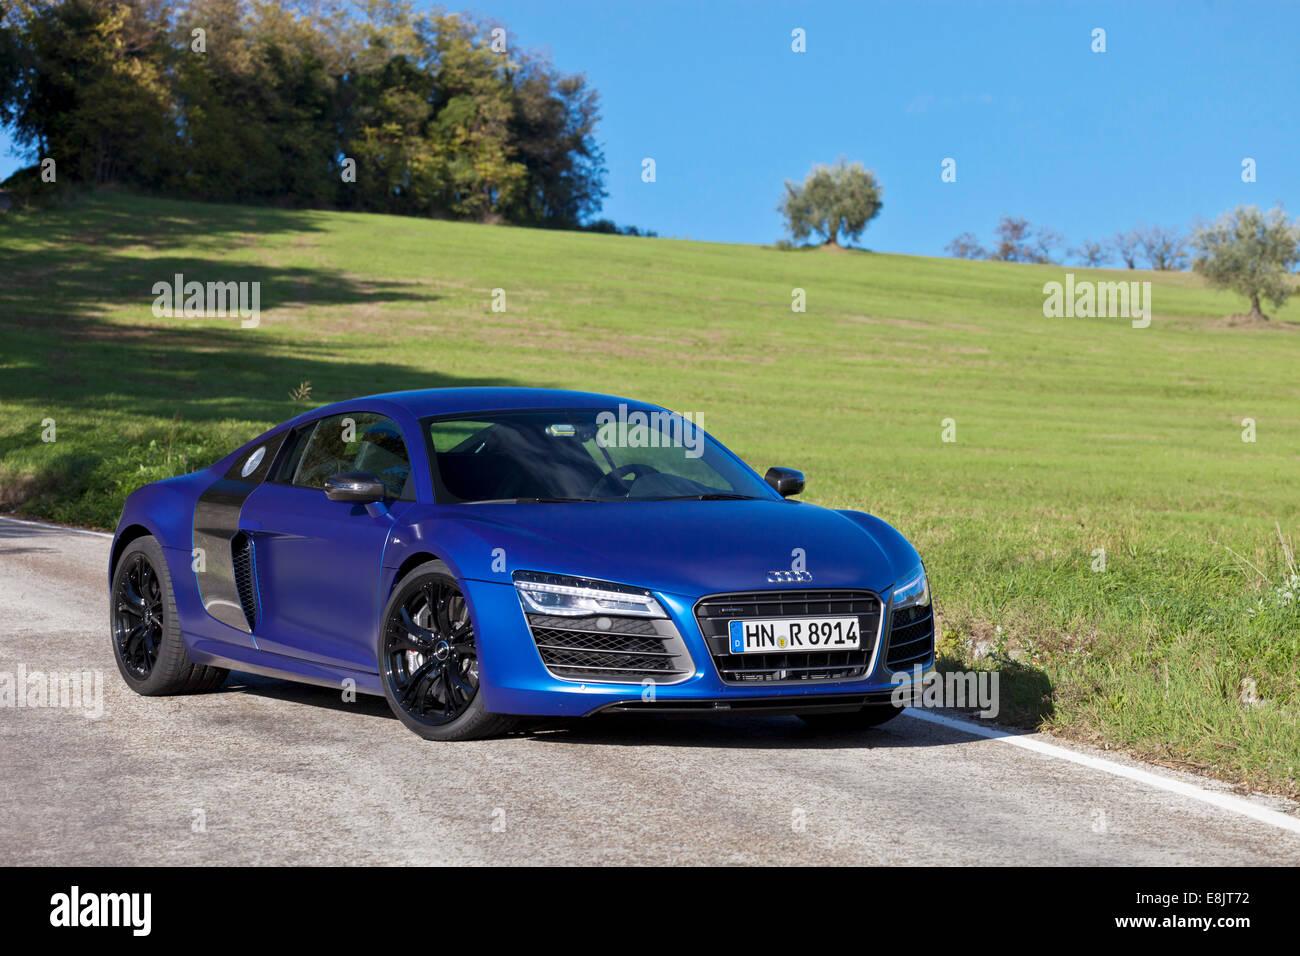 Audi R8 V10 Plus - Stock Image